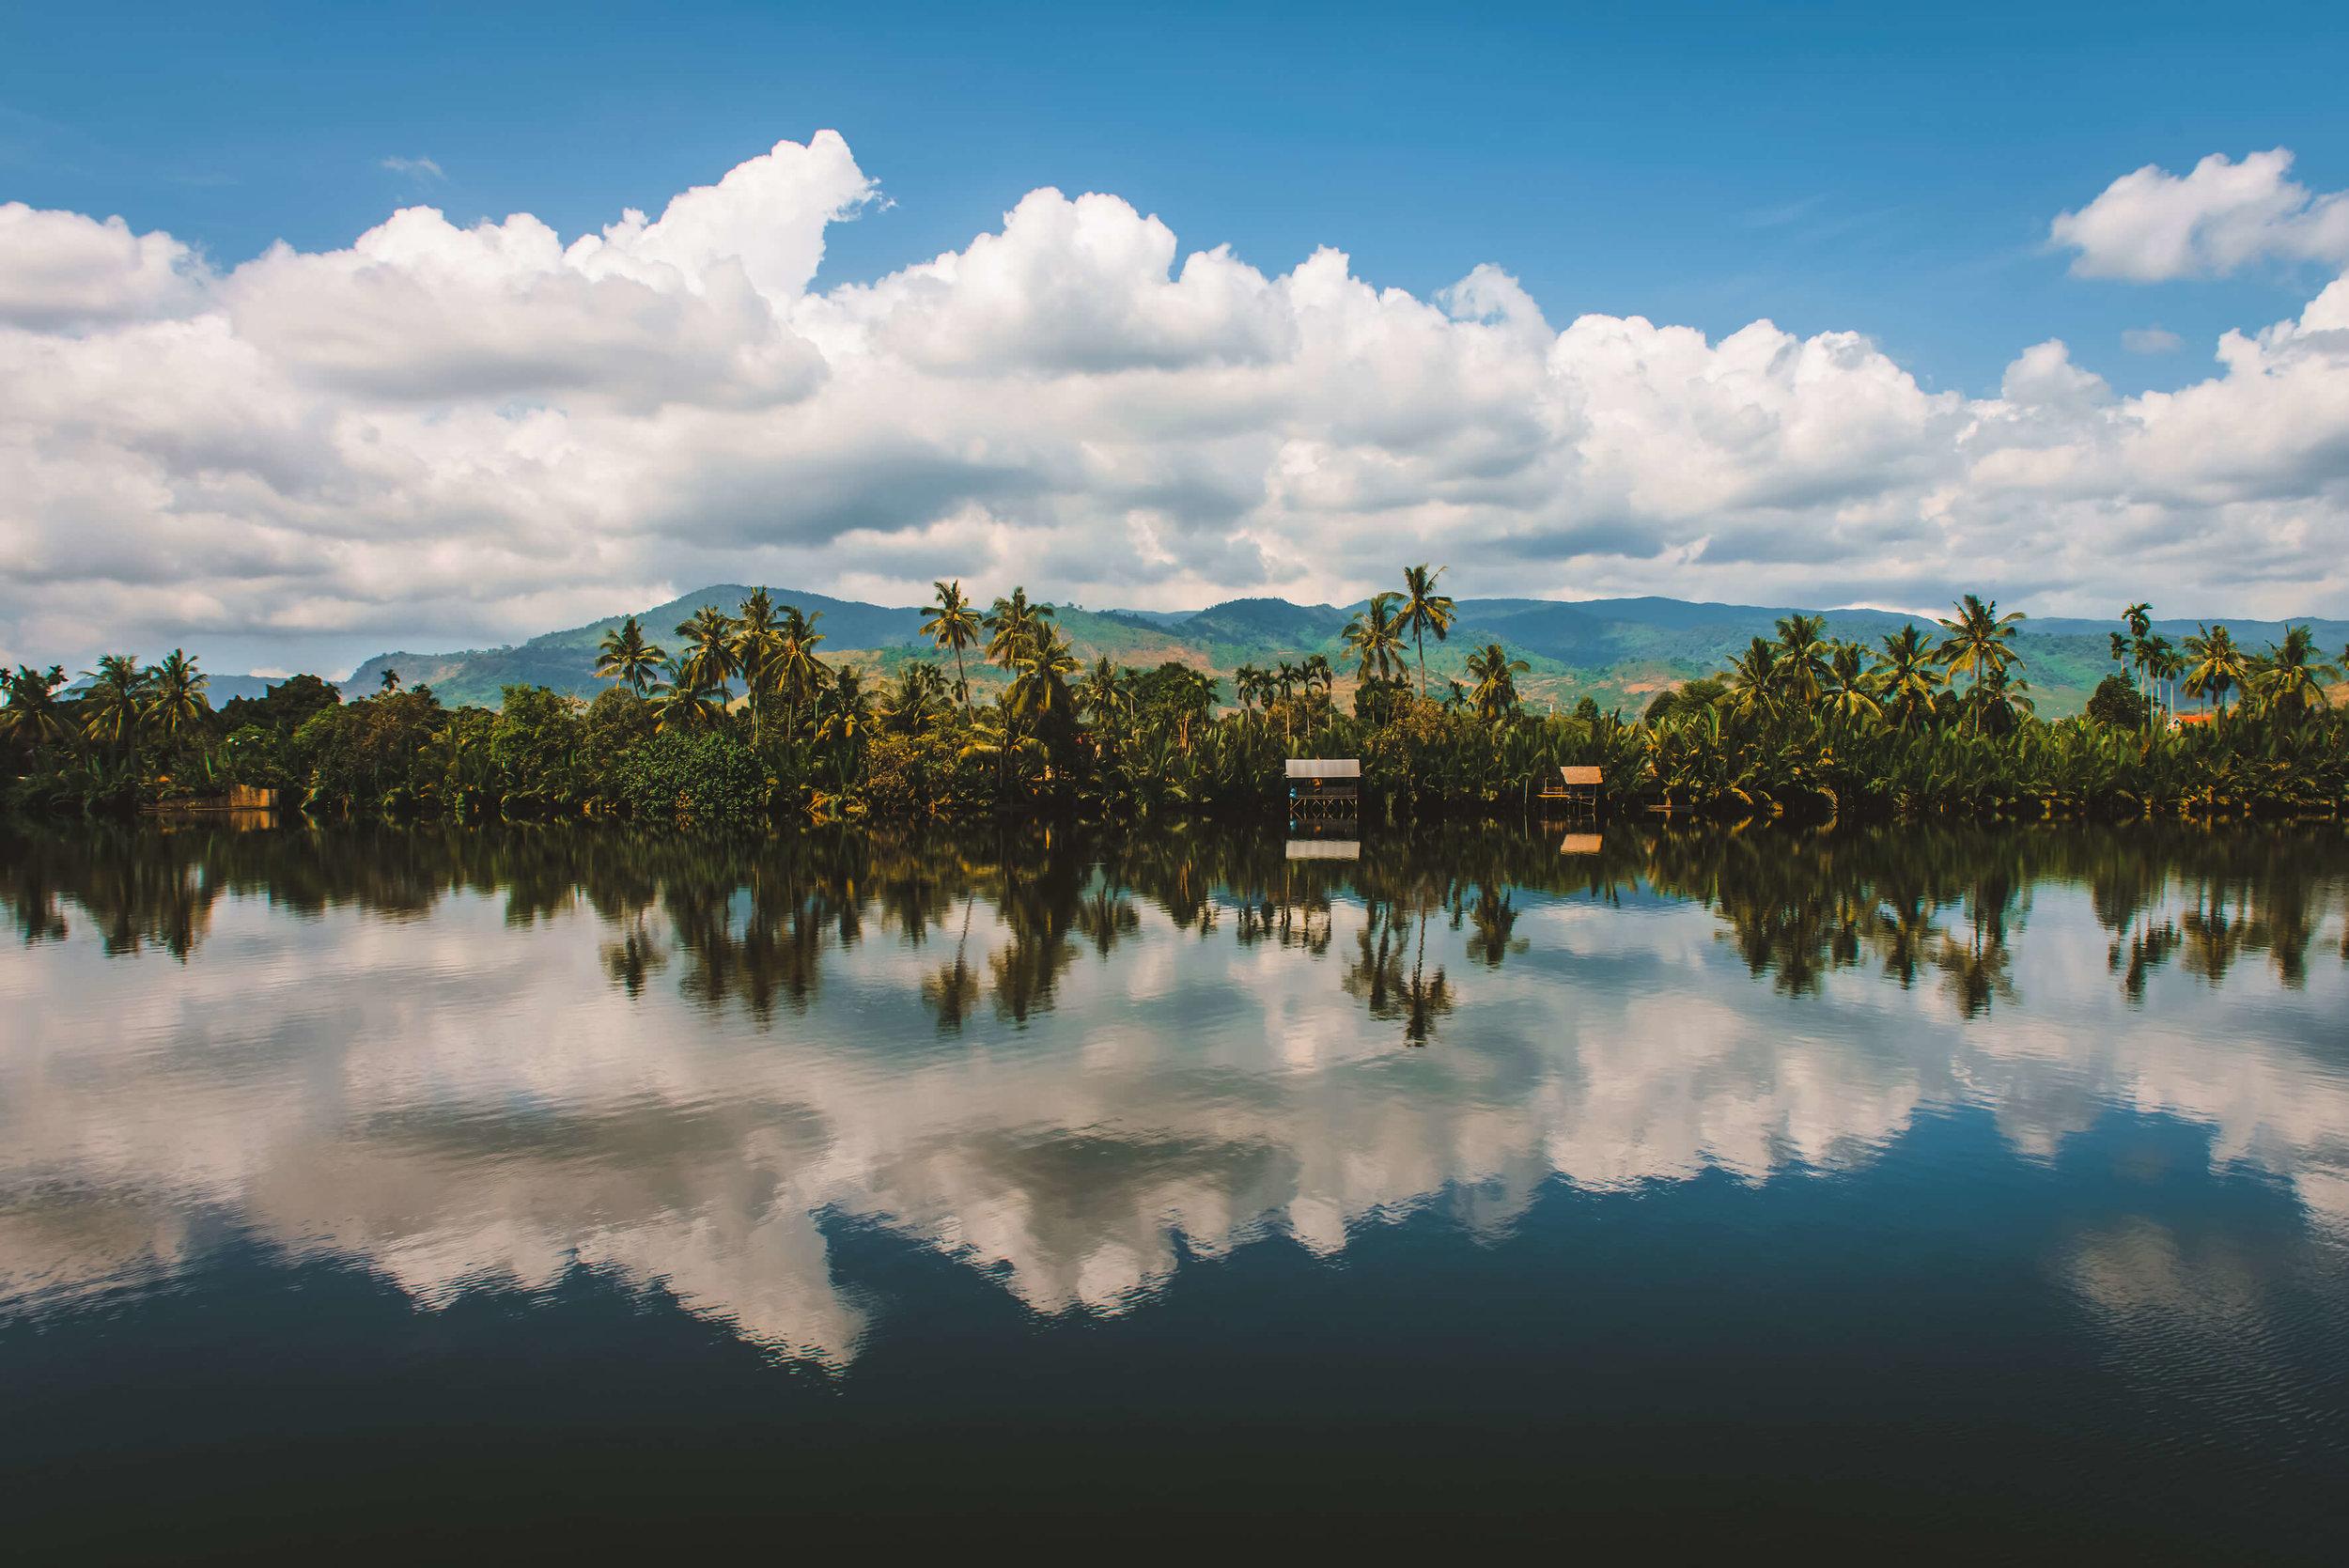 yogaretreat_yoga_meditation_retreat_cambodia_tula_river_retreat_2_3.jpg